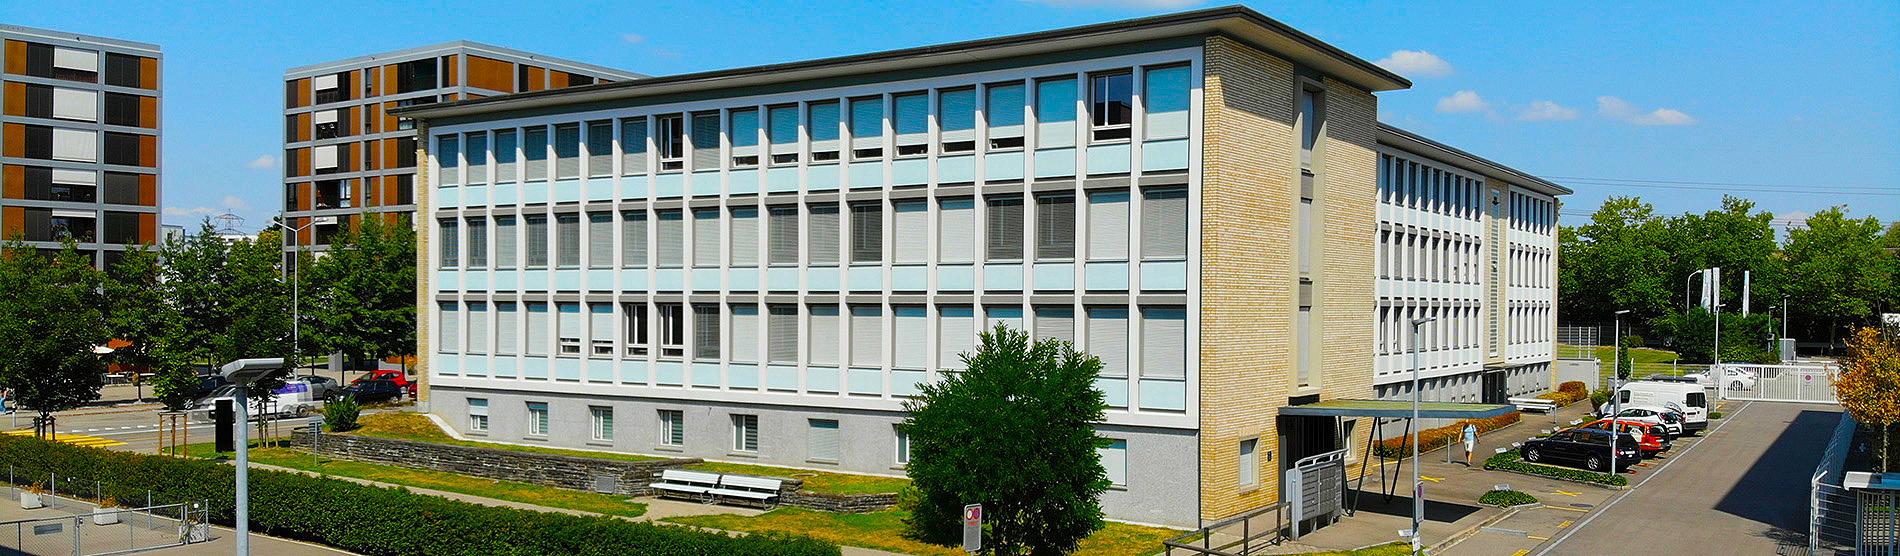 Softwareentwicklung Zürich